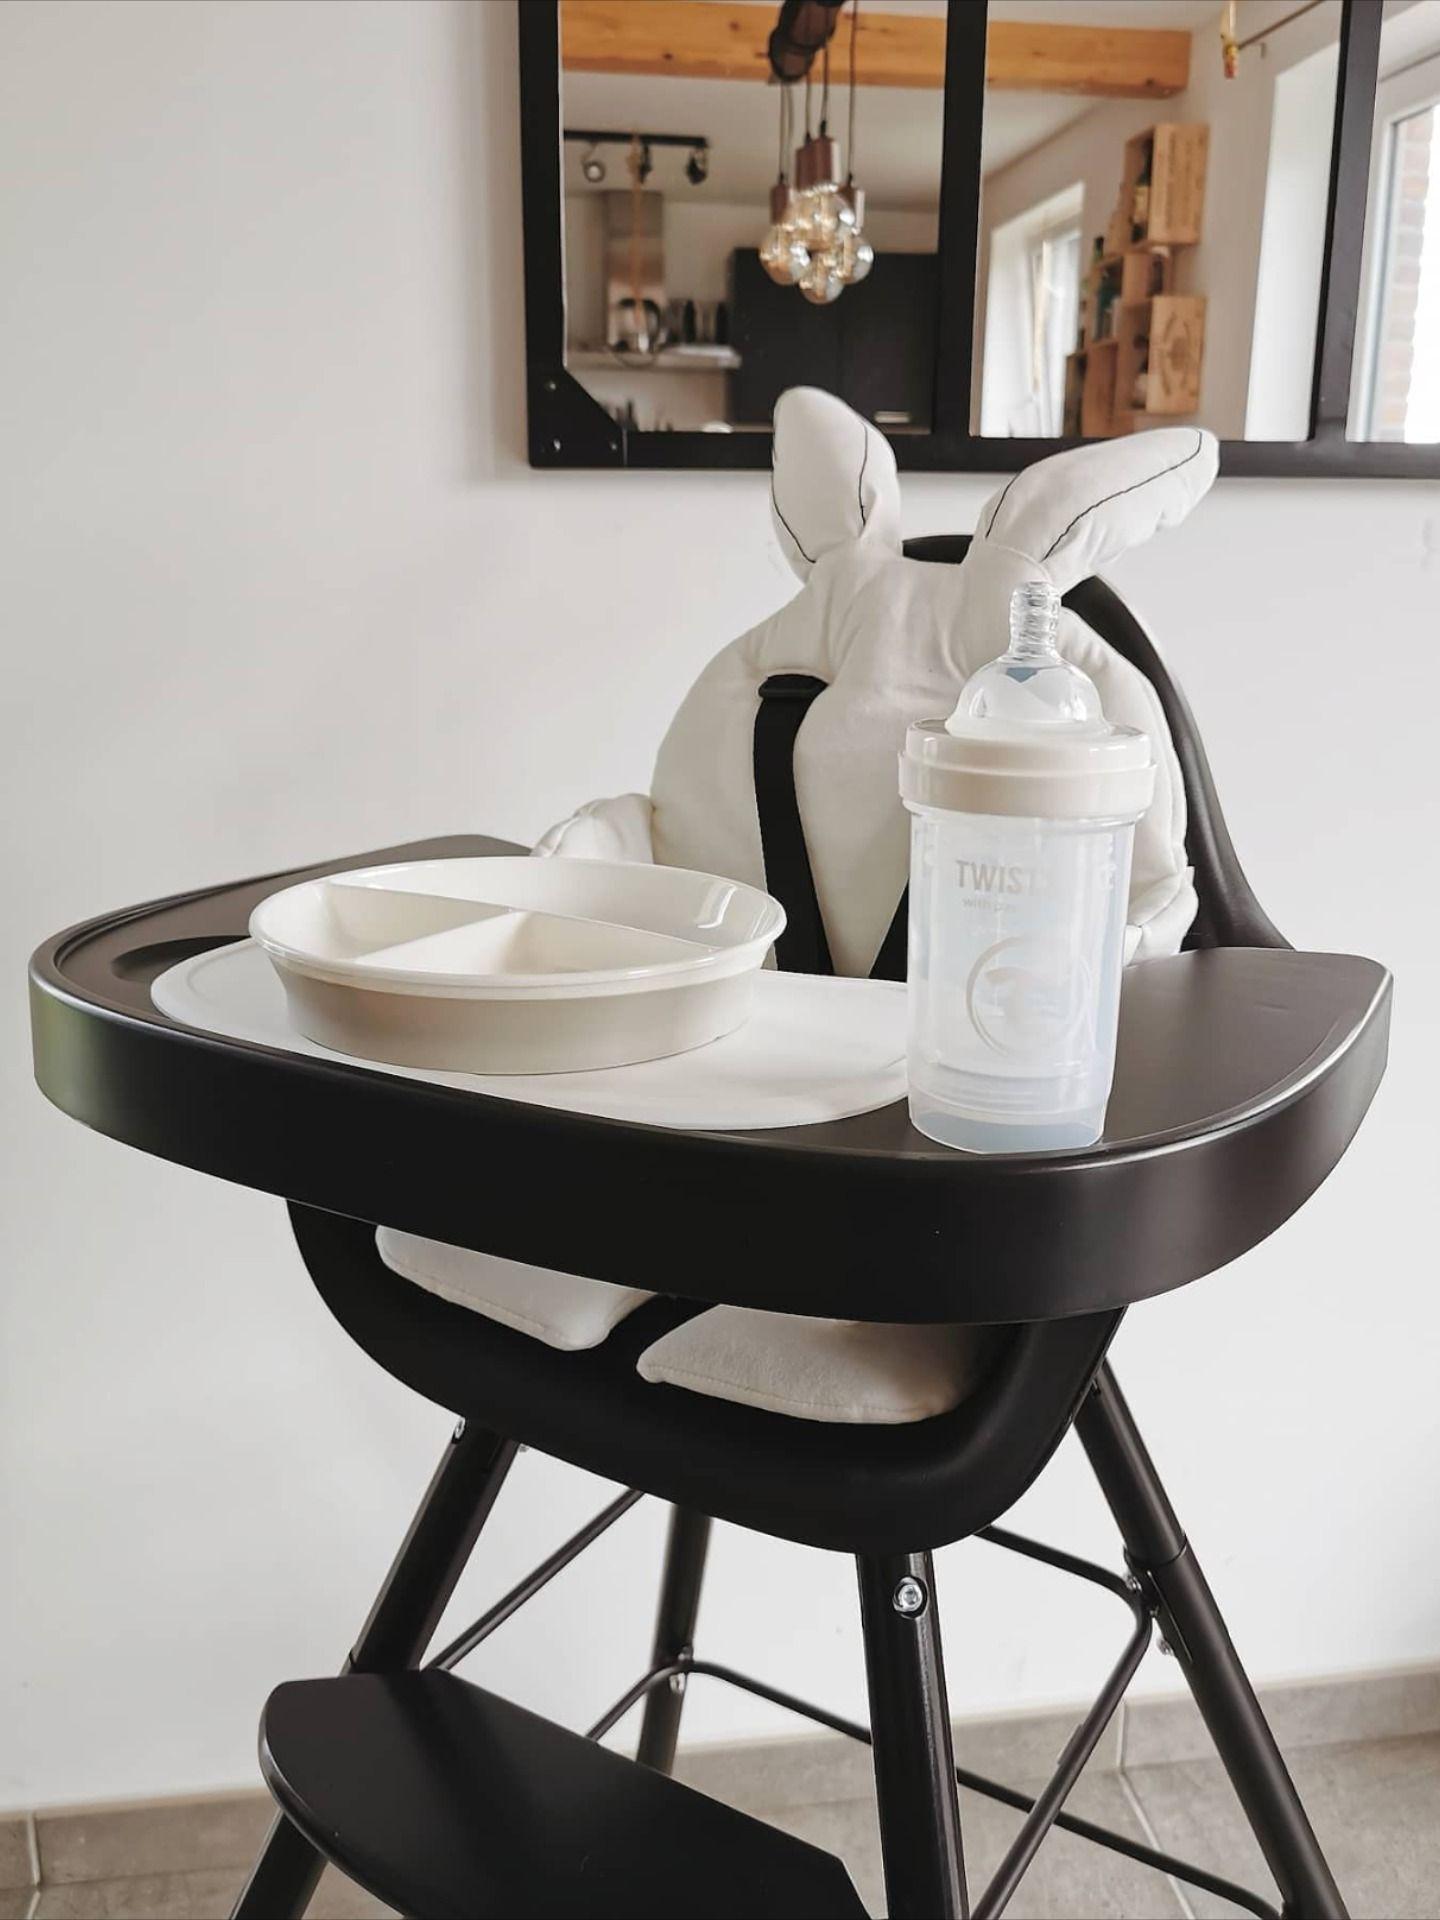 Evolu 2 High Chair Adjustable In Height (5075 Cm/*90 Cm